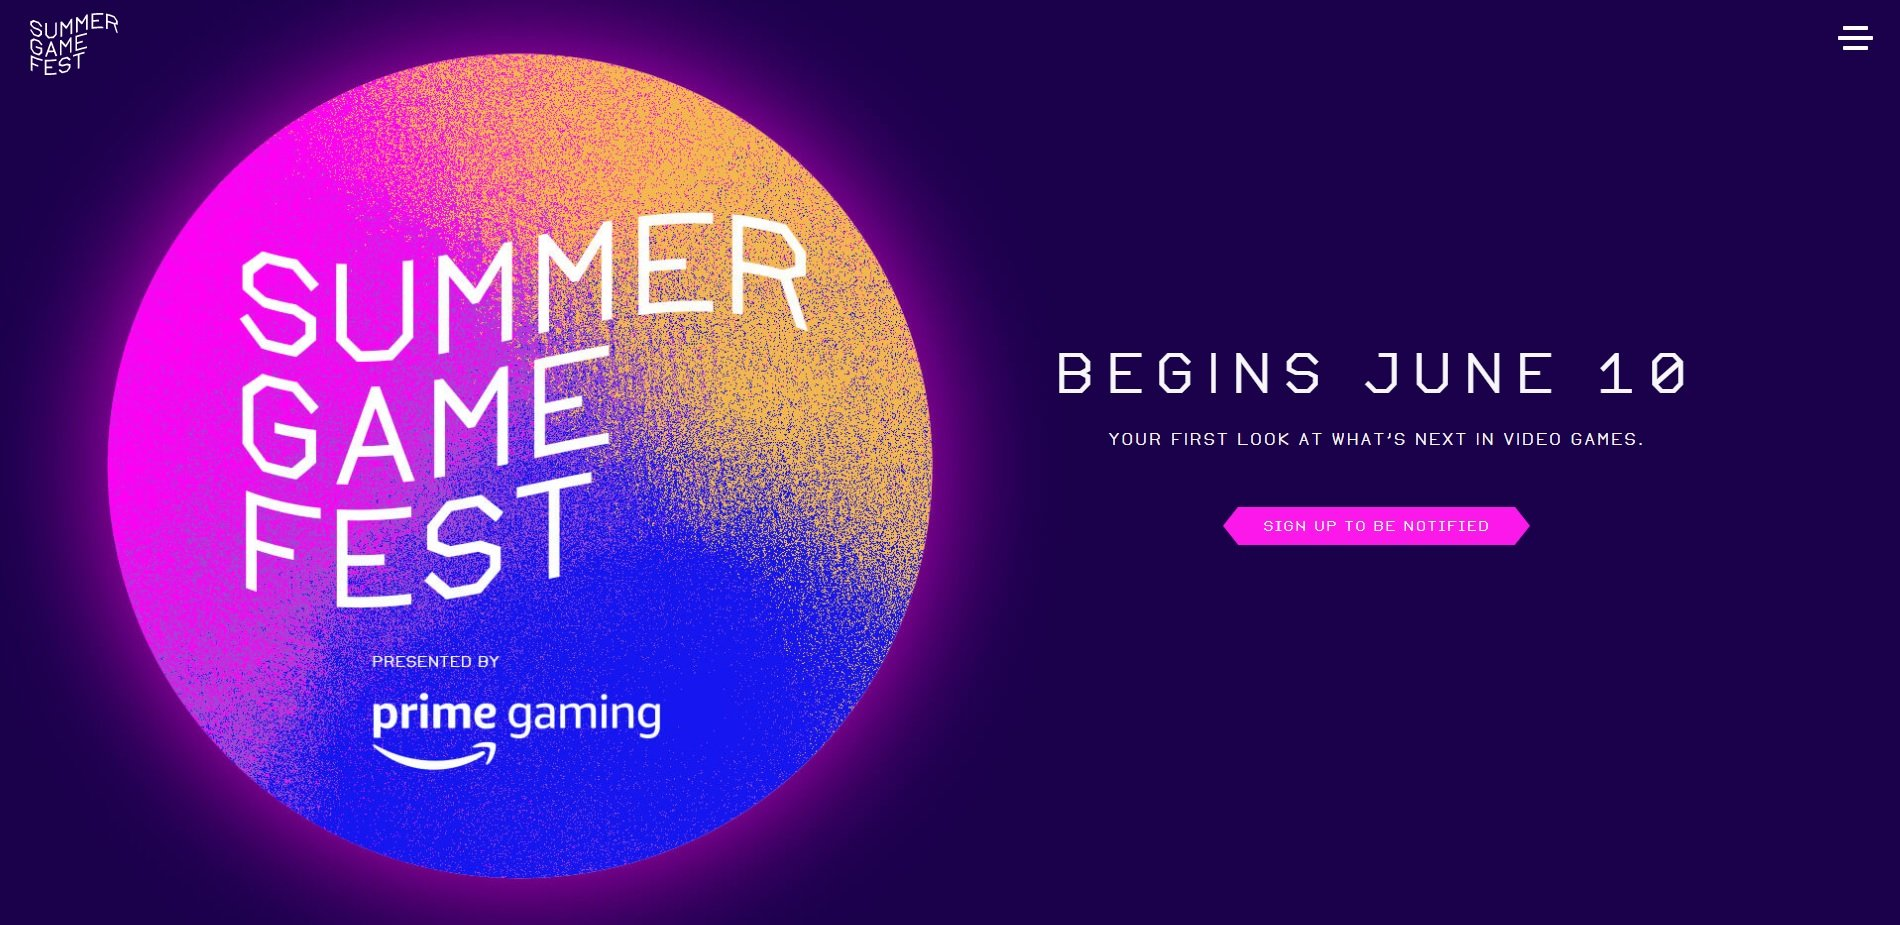 Summer Game Fest confirms June 10 showcase ahead of E3